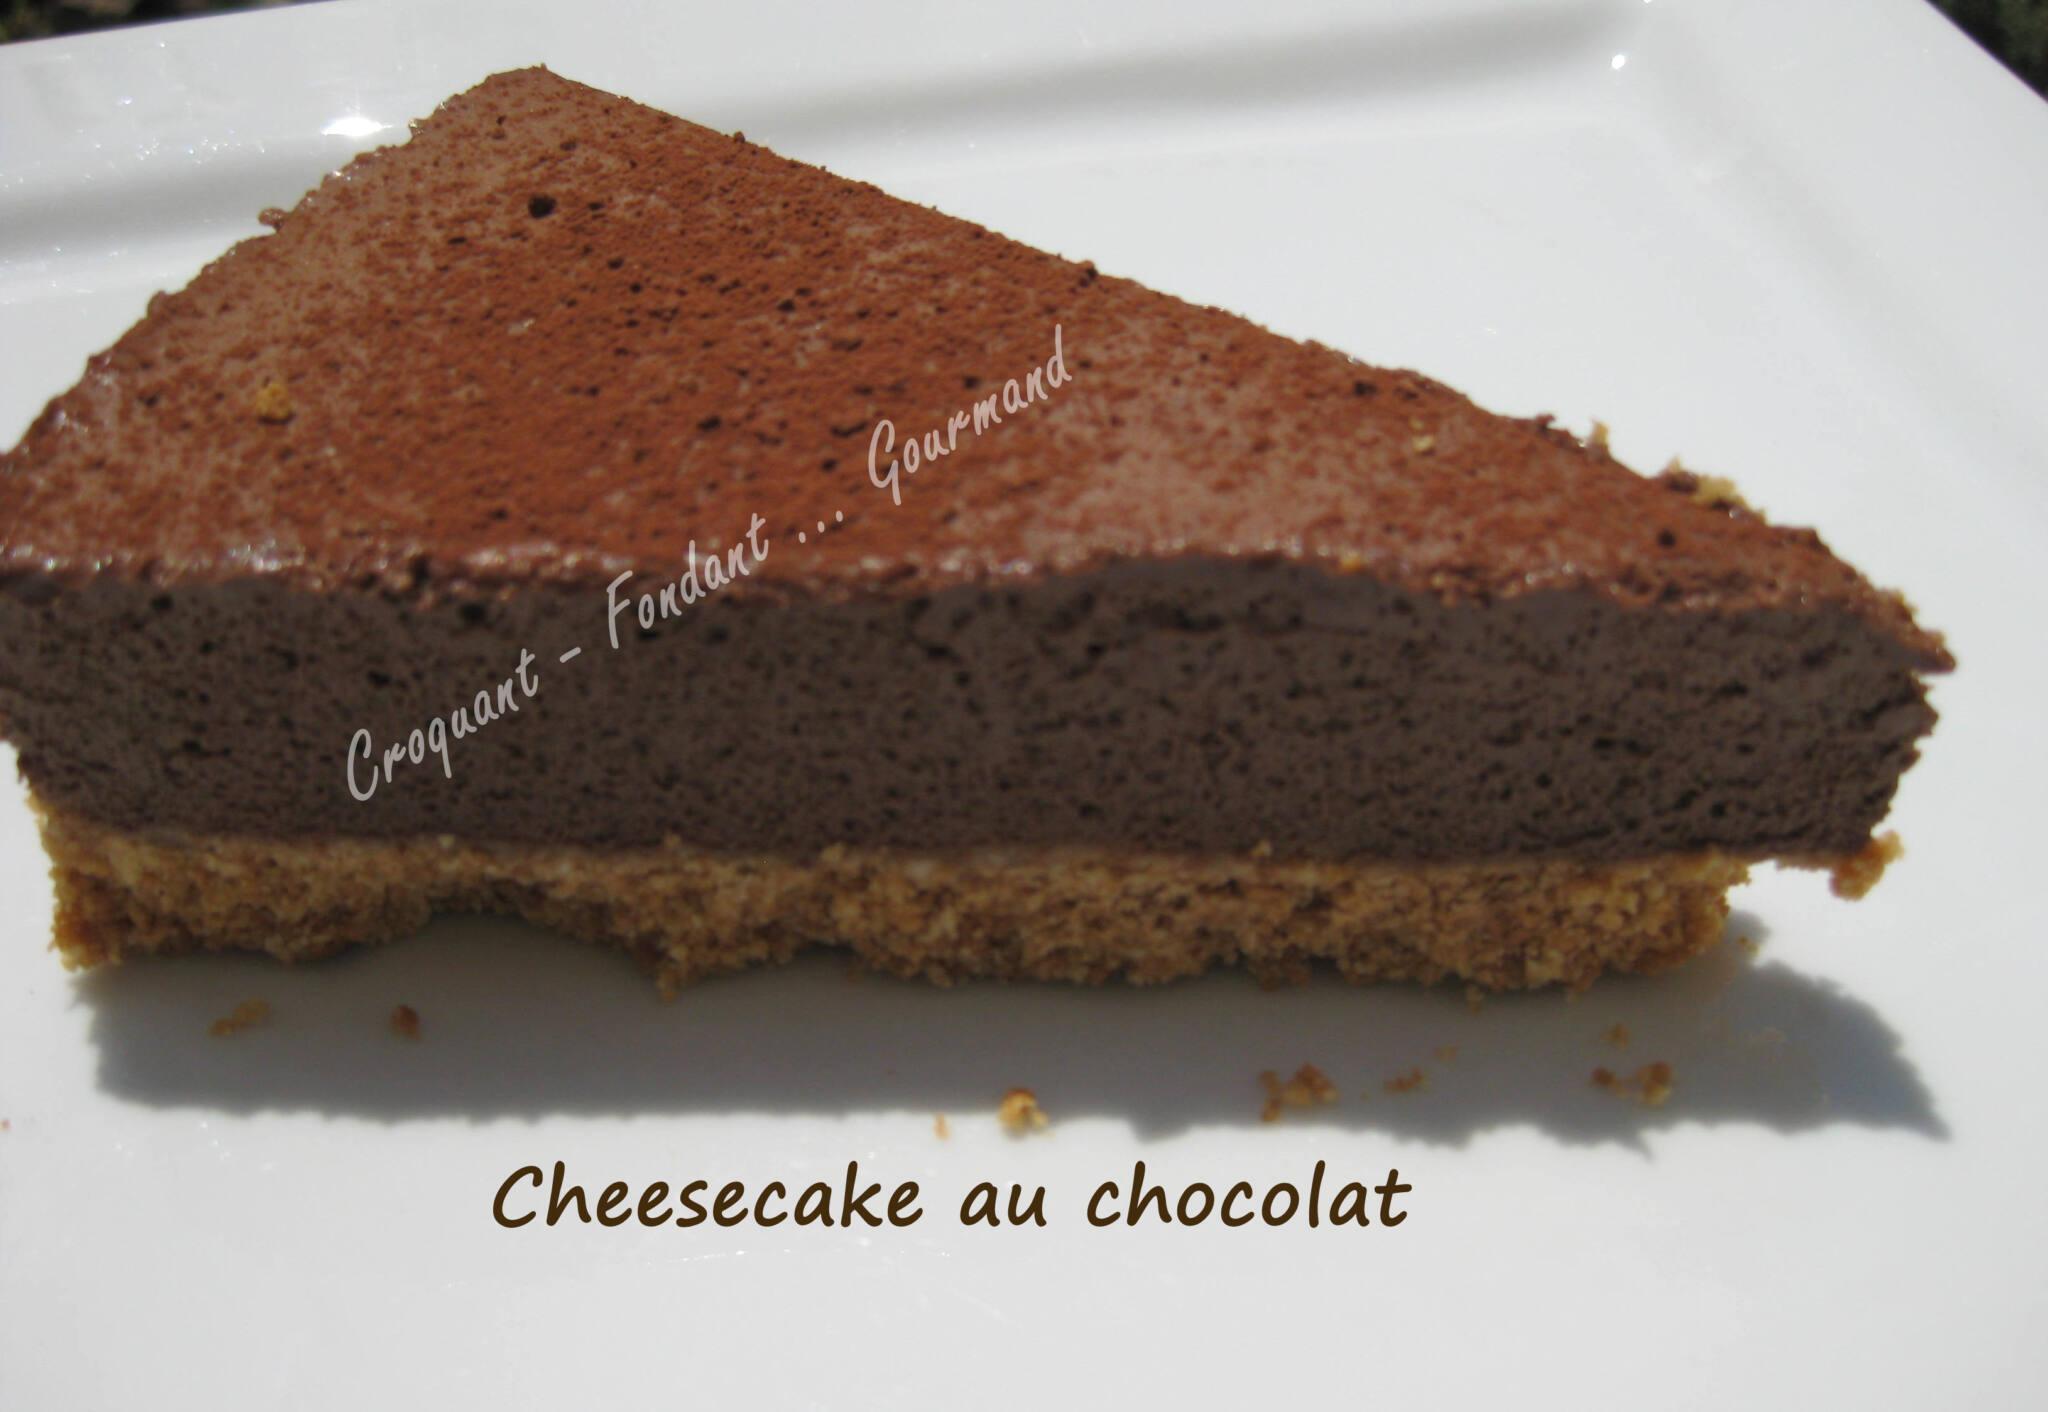 Cheesecake chocolat. - Croquant Fondant Gourmand